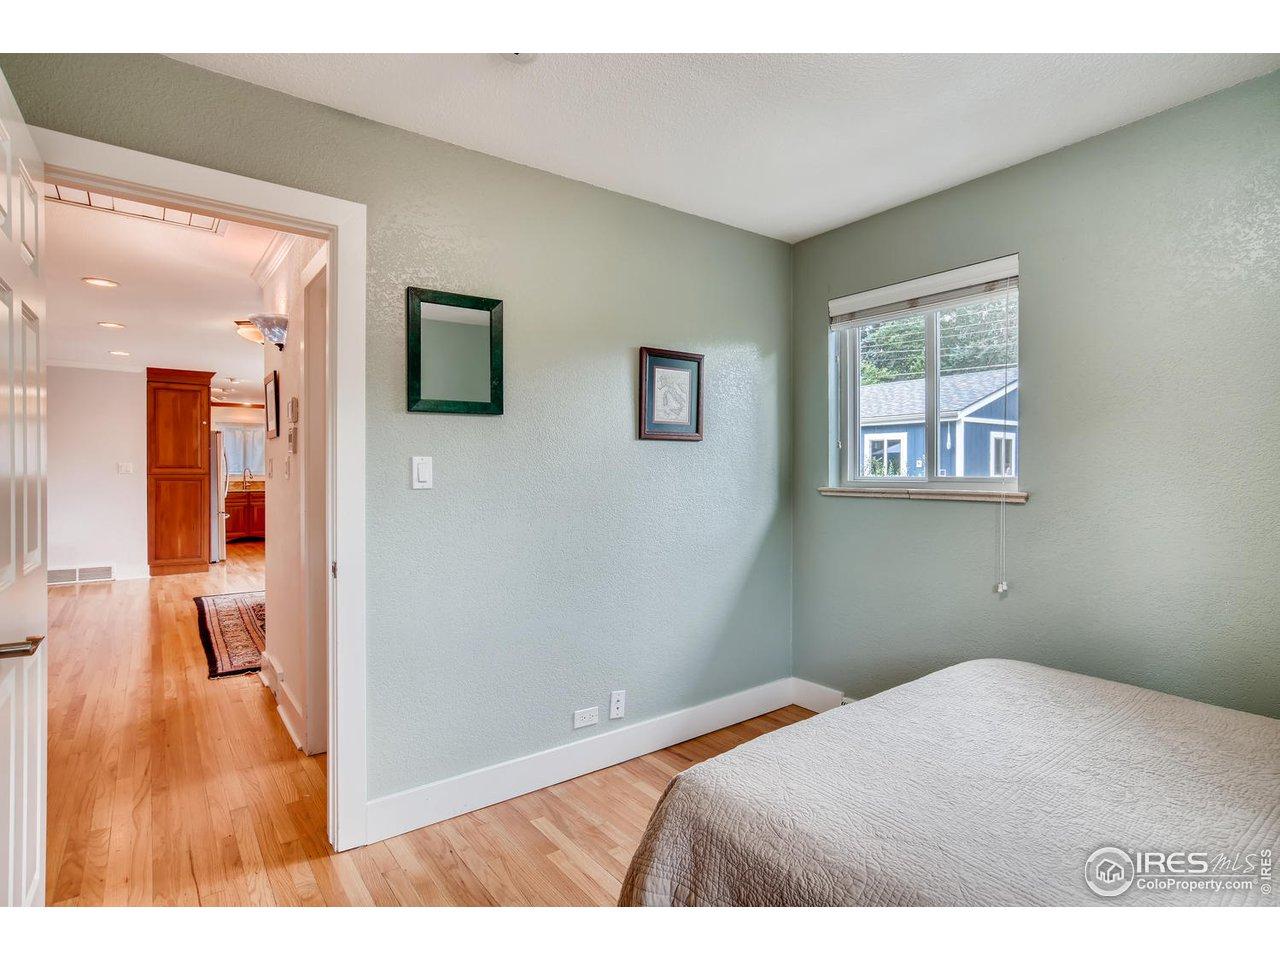 2nd bedroom facing Hallway